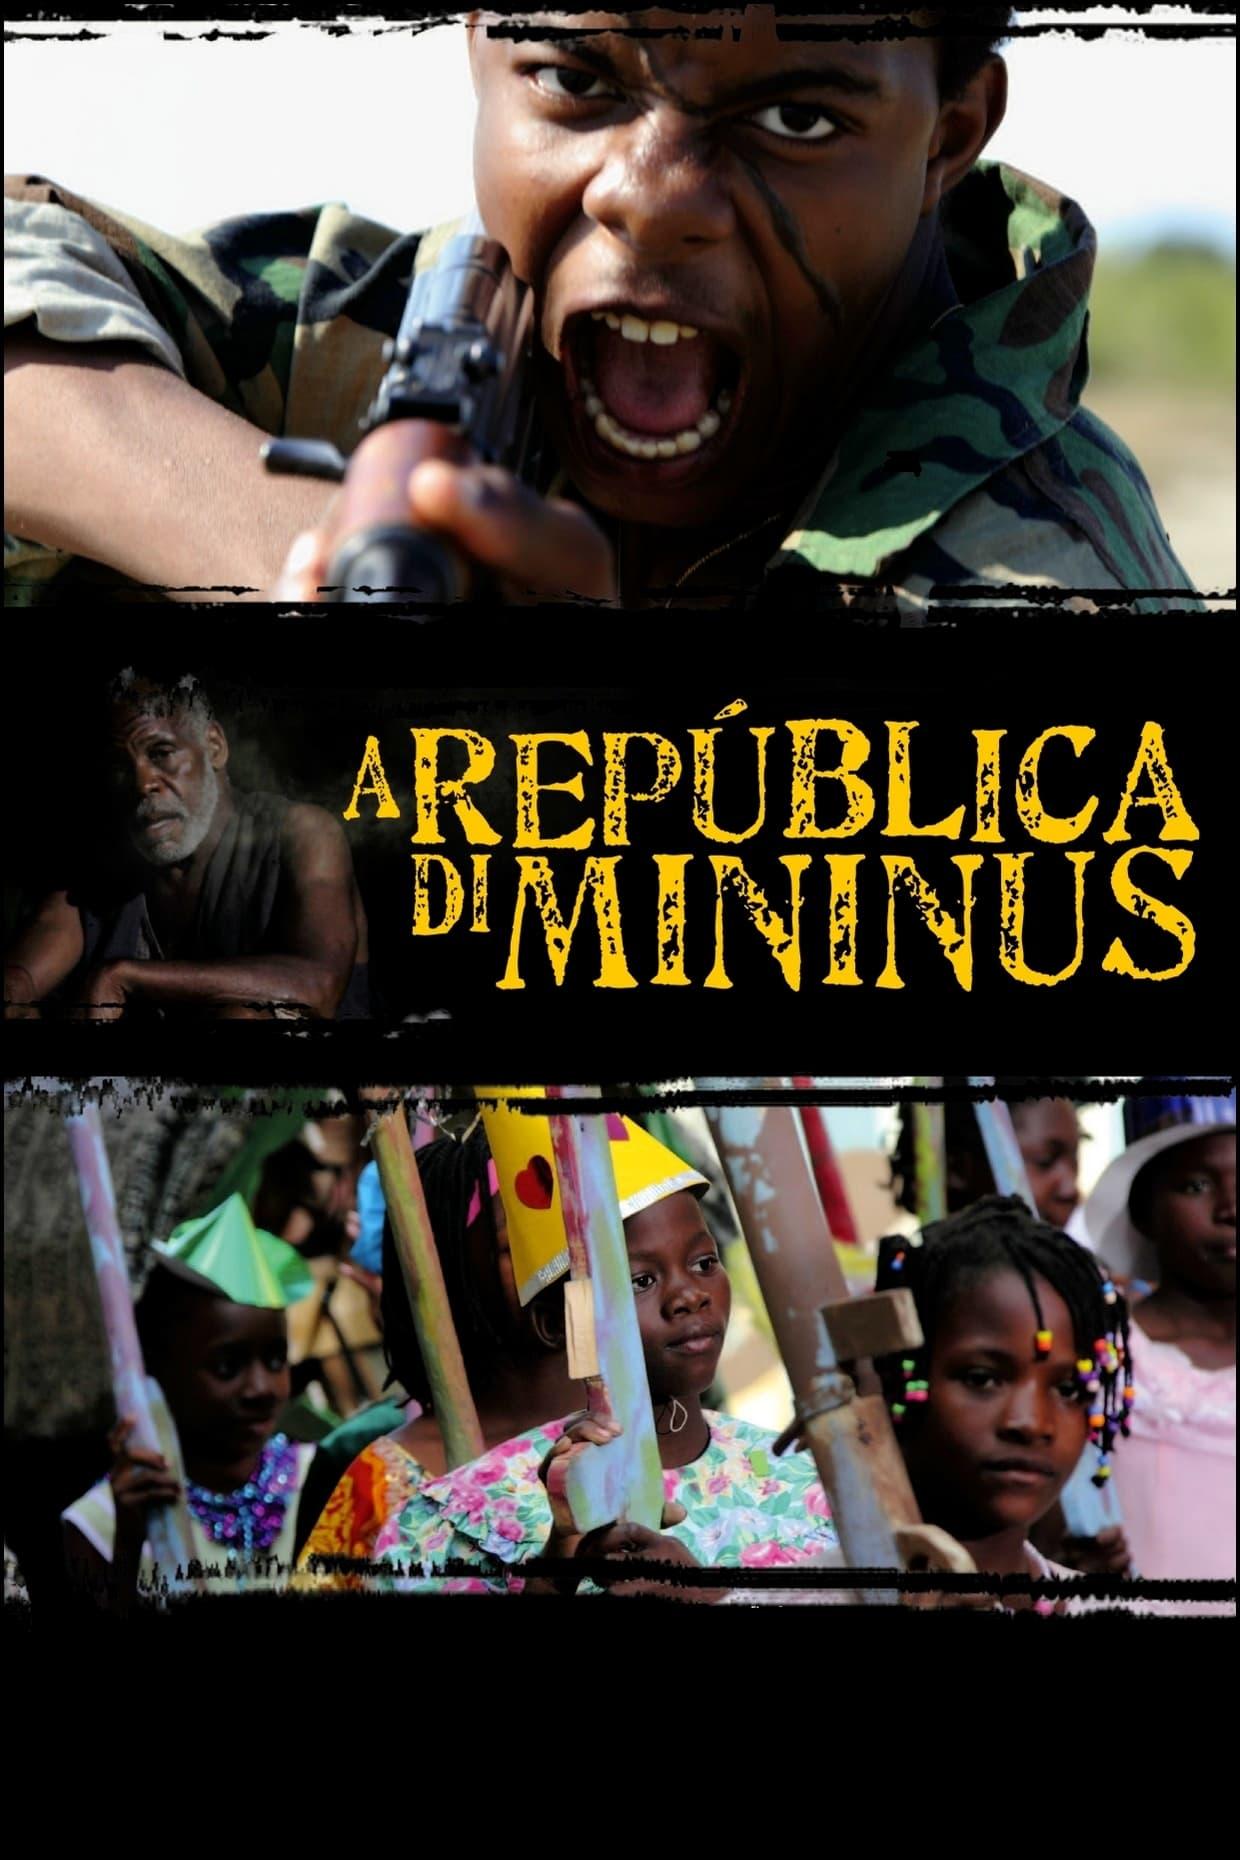 The Children's Republic